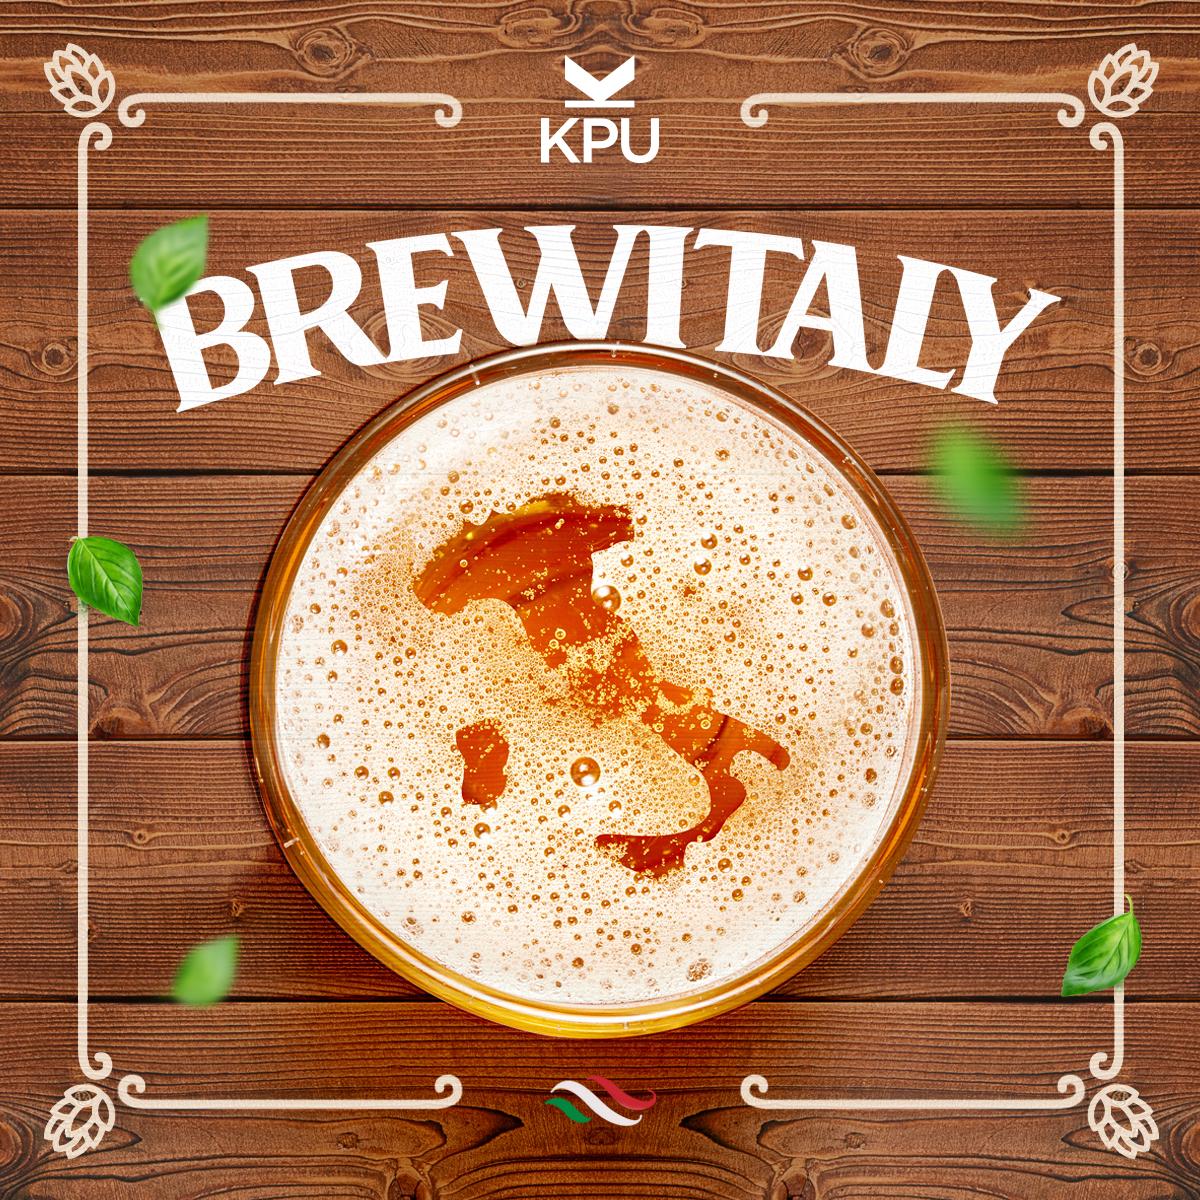 BrewItaly — Craft Beer + Italian Food Tasting Event